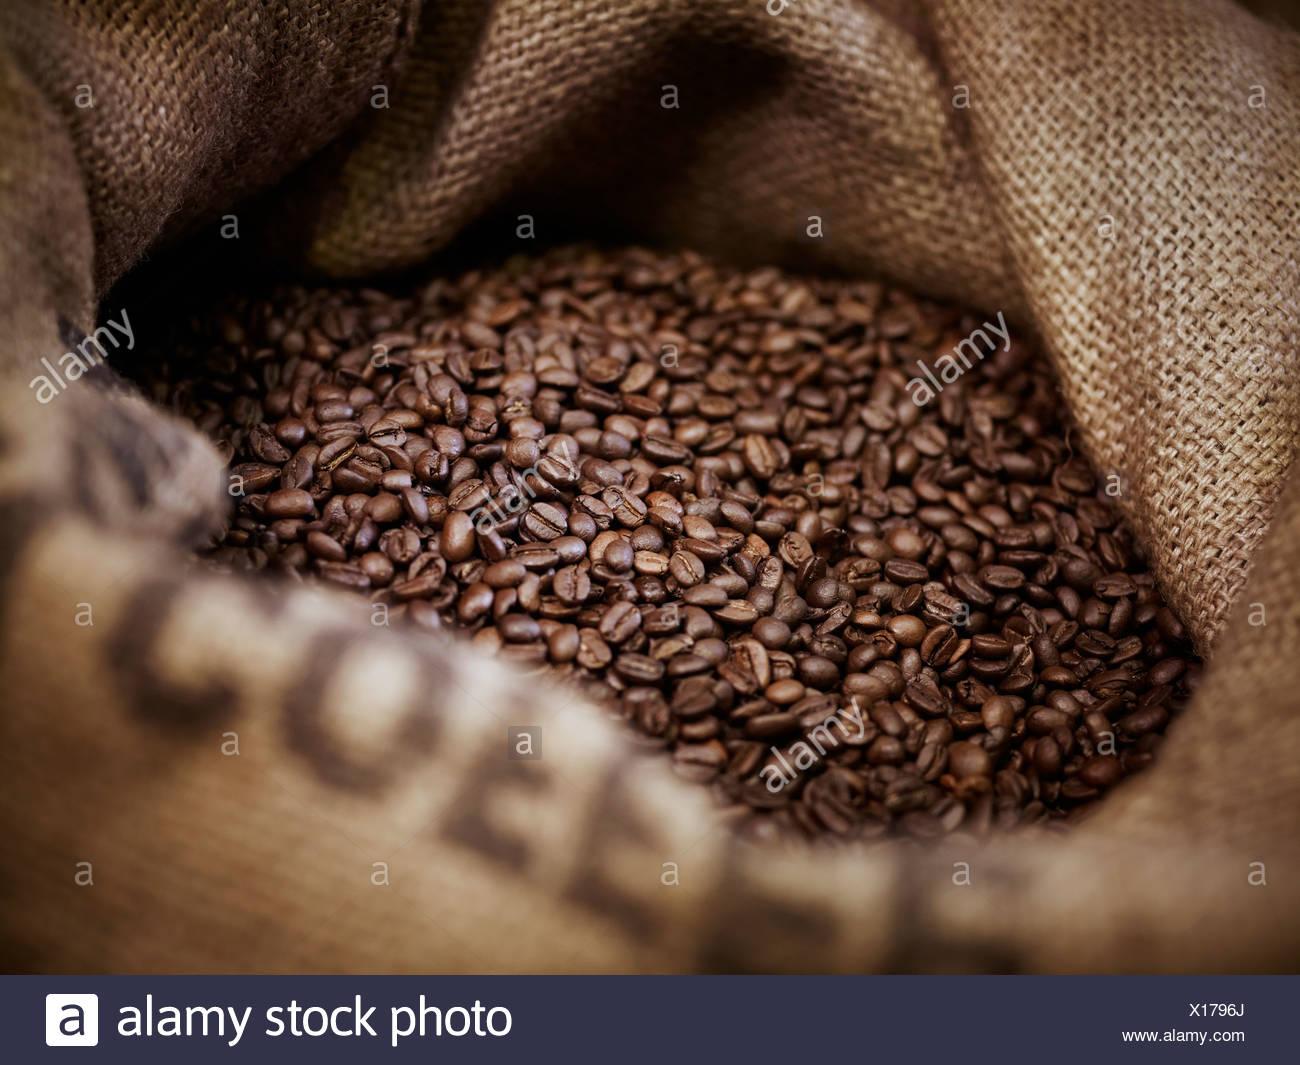 Coffee beans in burlap sack - Stock Image